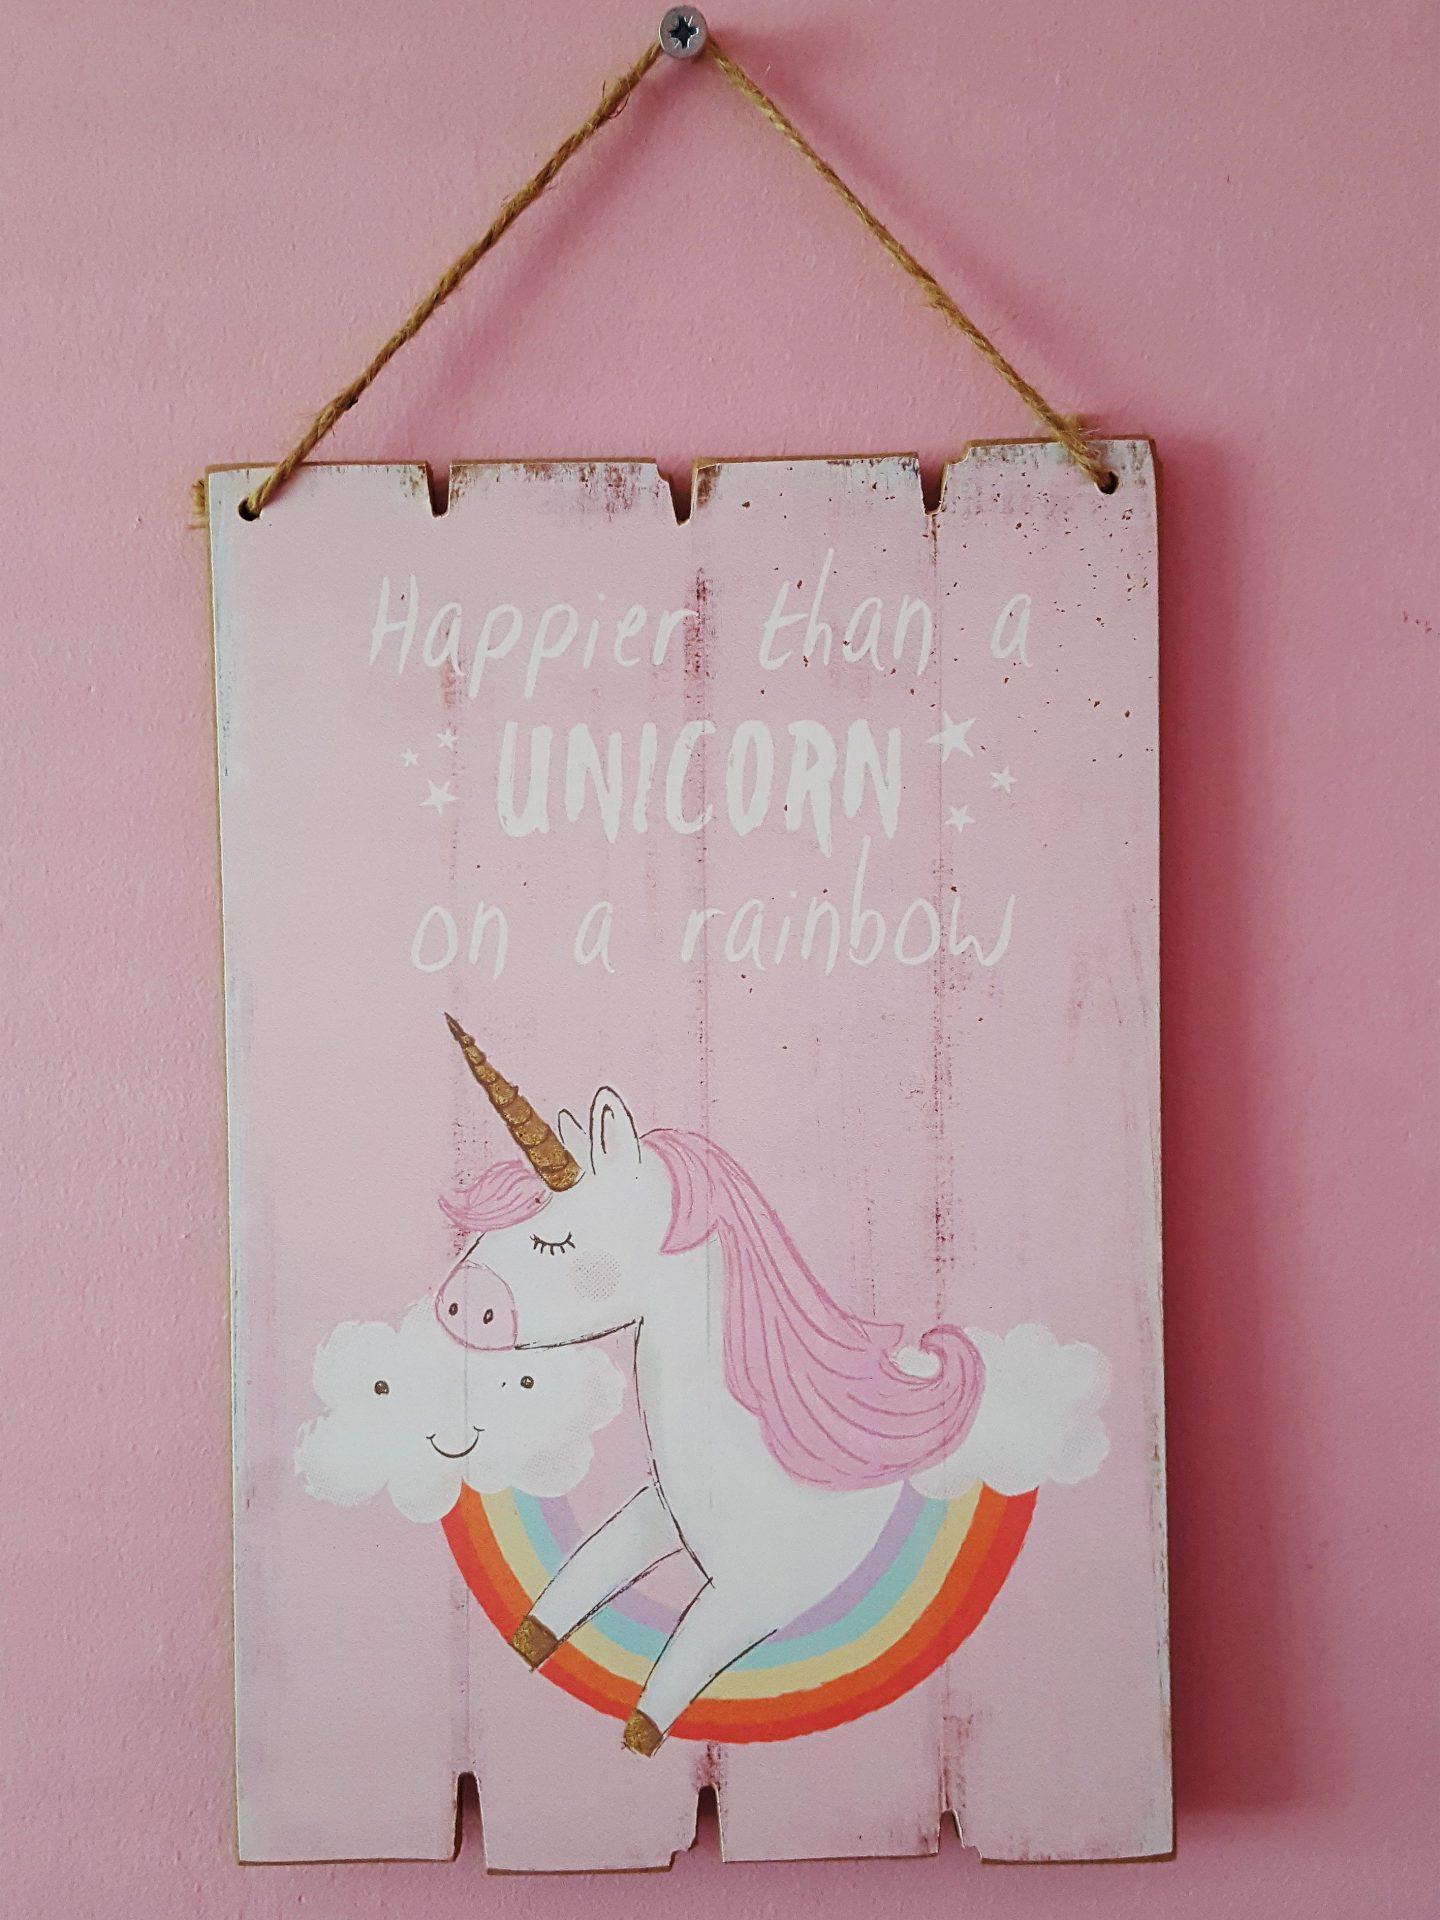 A Unicorn Bedroom The Hearty Life